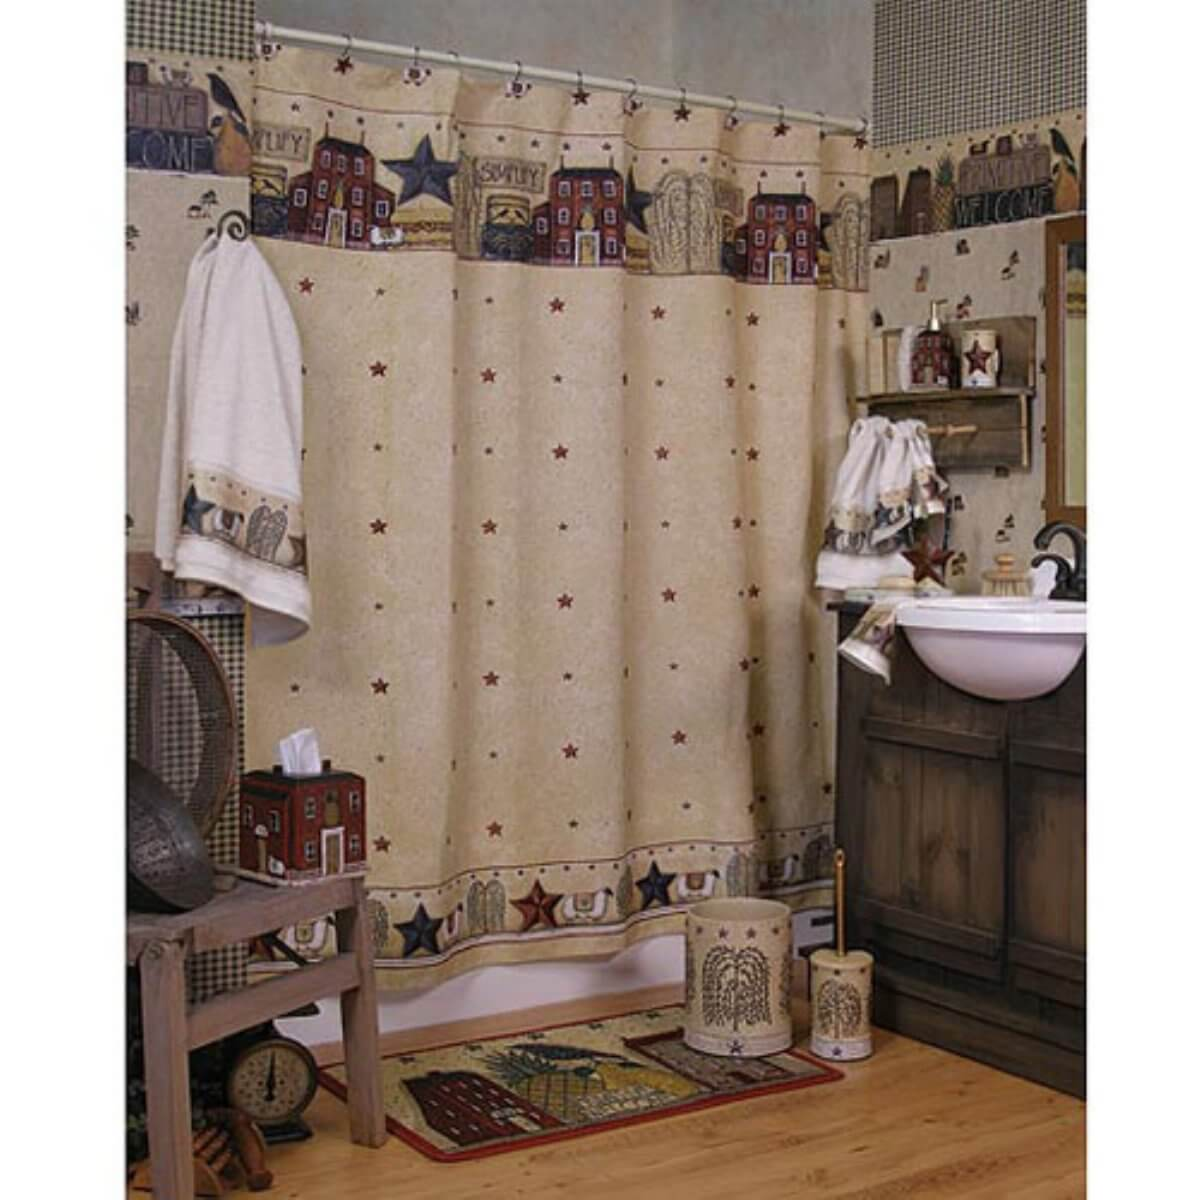 Bedårande primitivt badrum